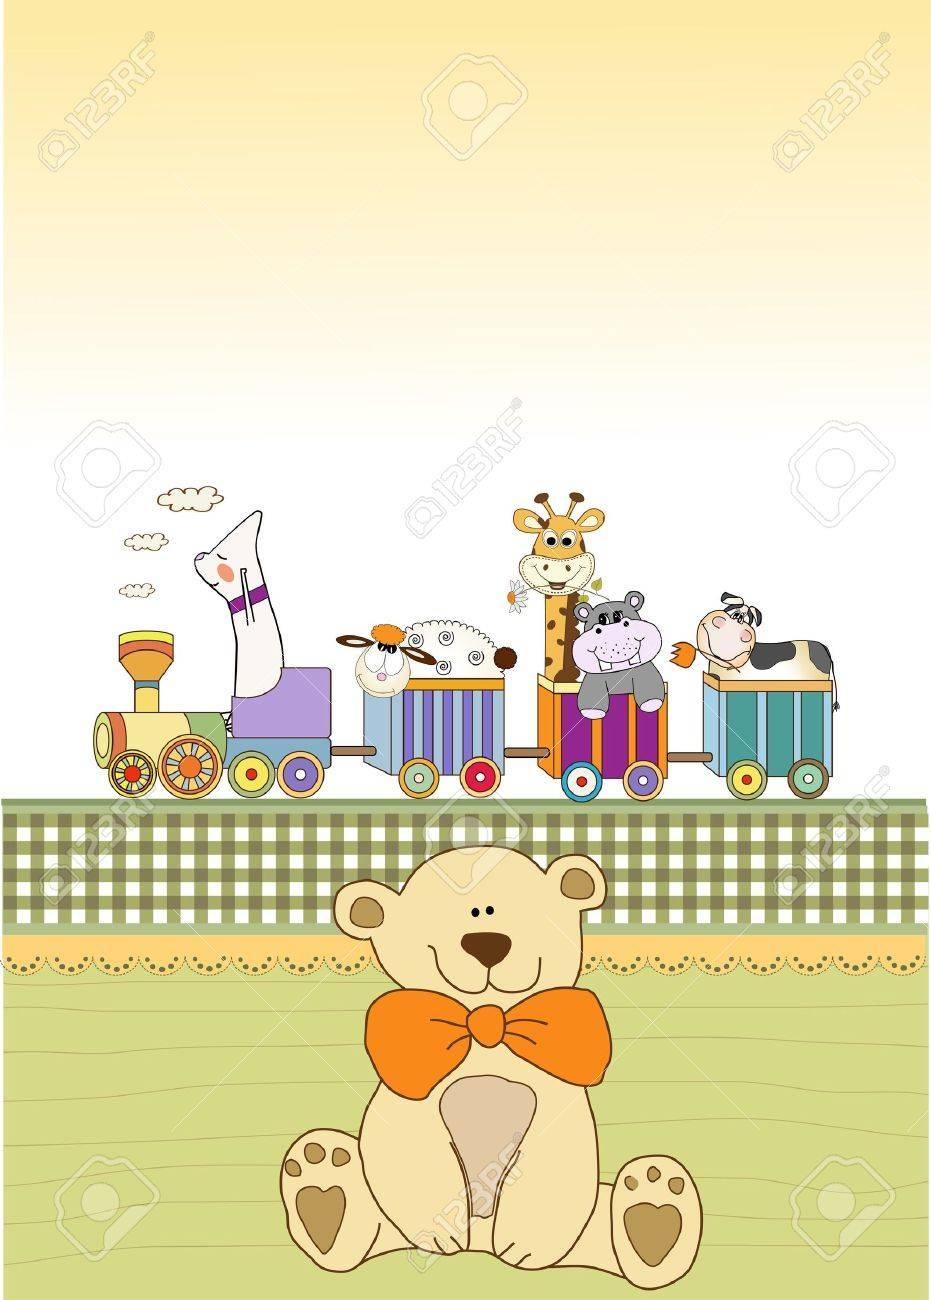 customizable birthday card with animal toys train Stock Vector - 9806464